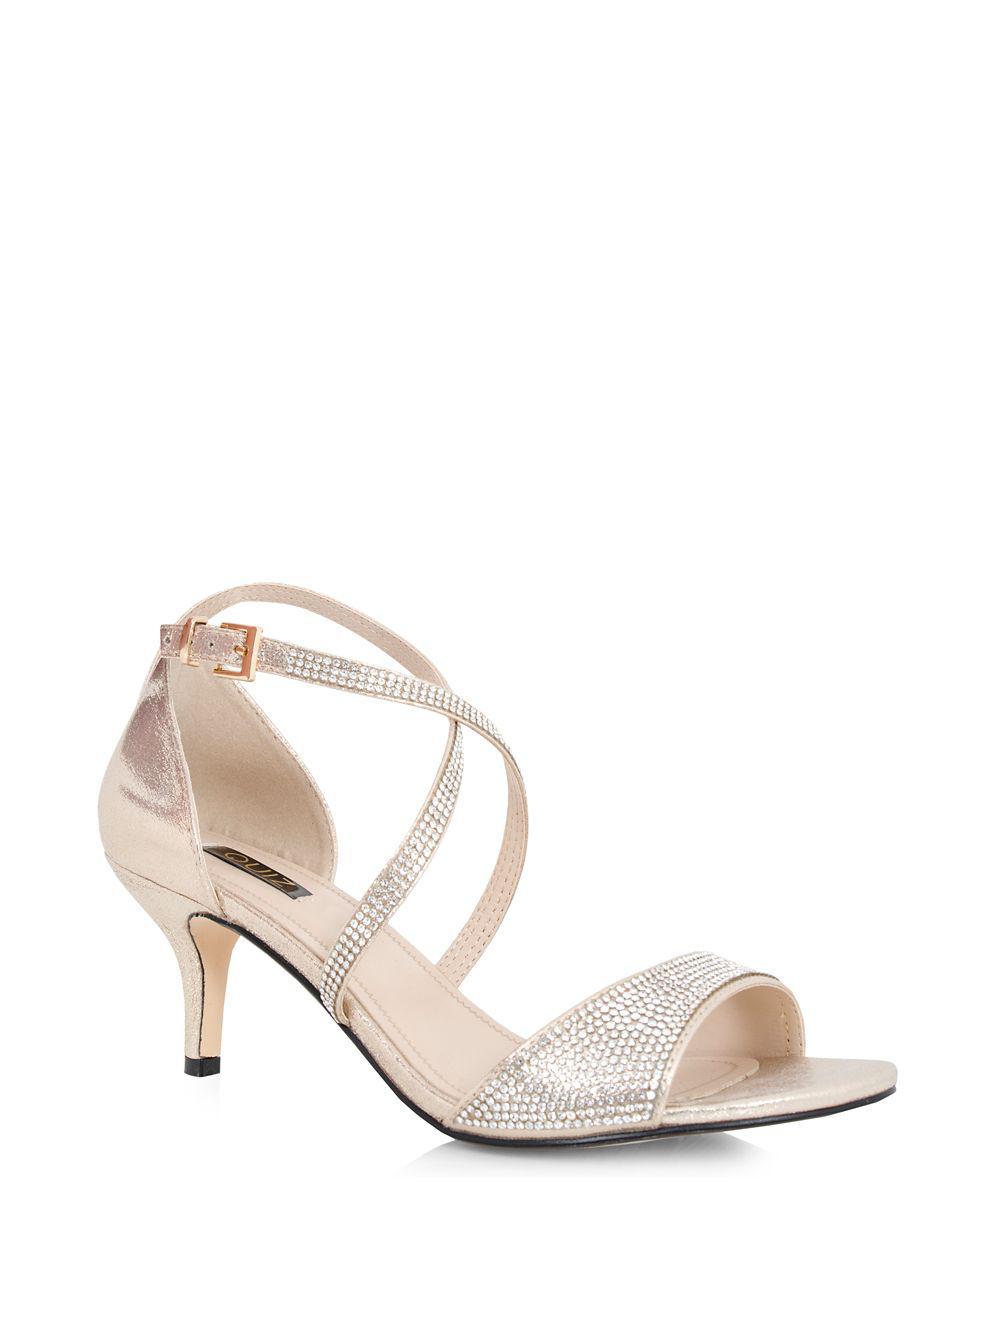 c0631f4e836 Quiz Metallic Shimmer Diamante Low-heel Pumps